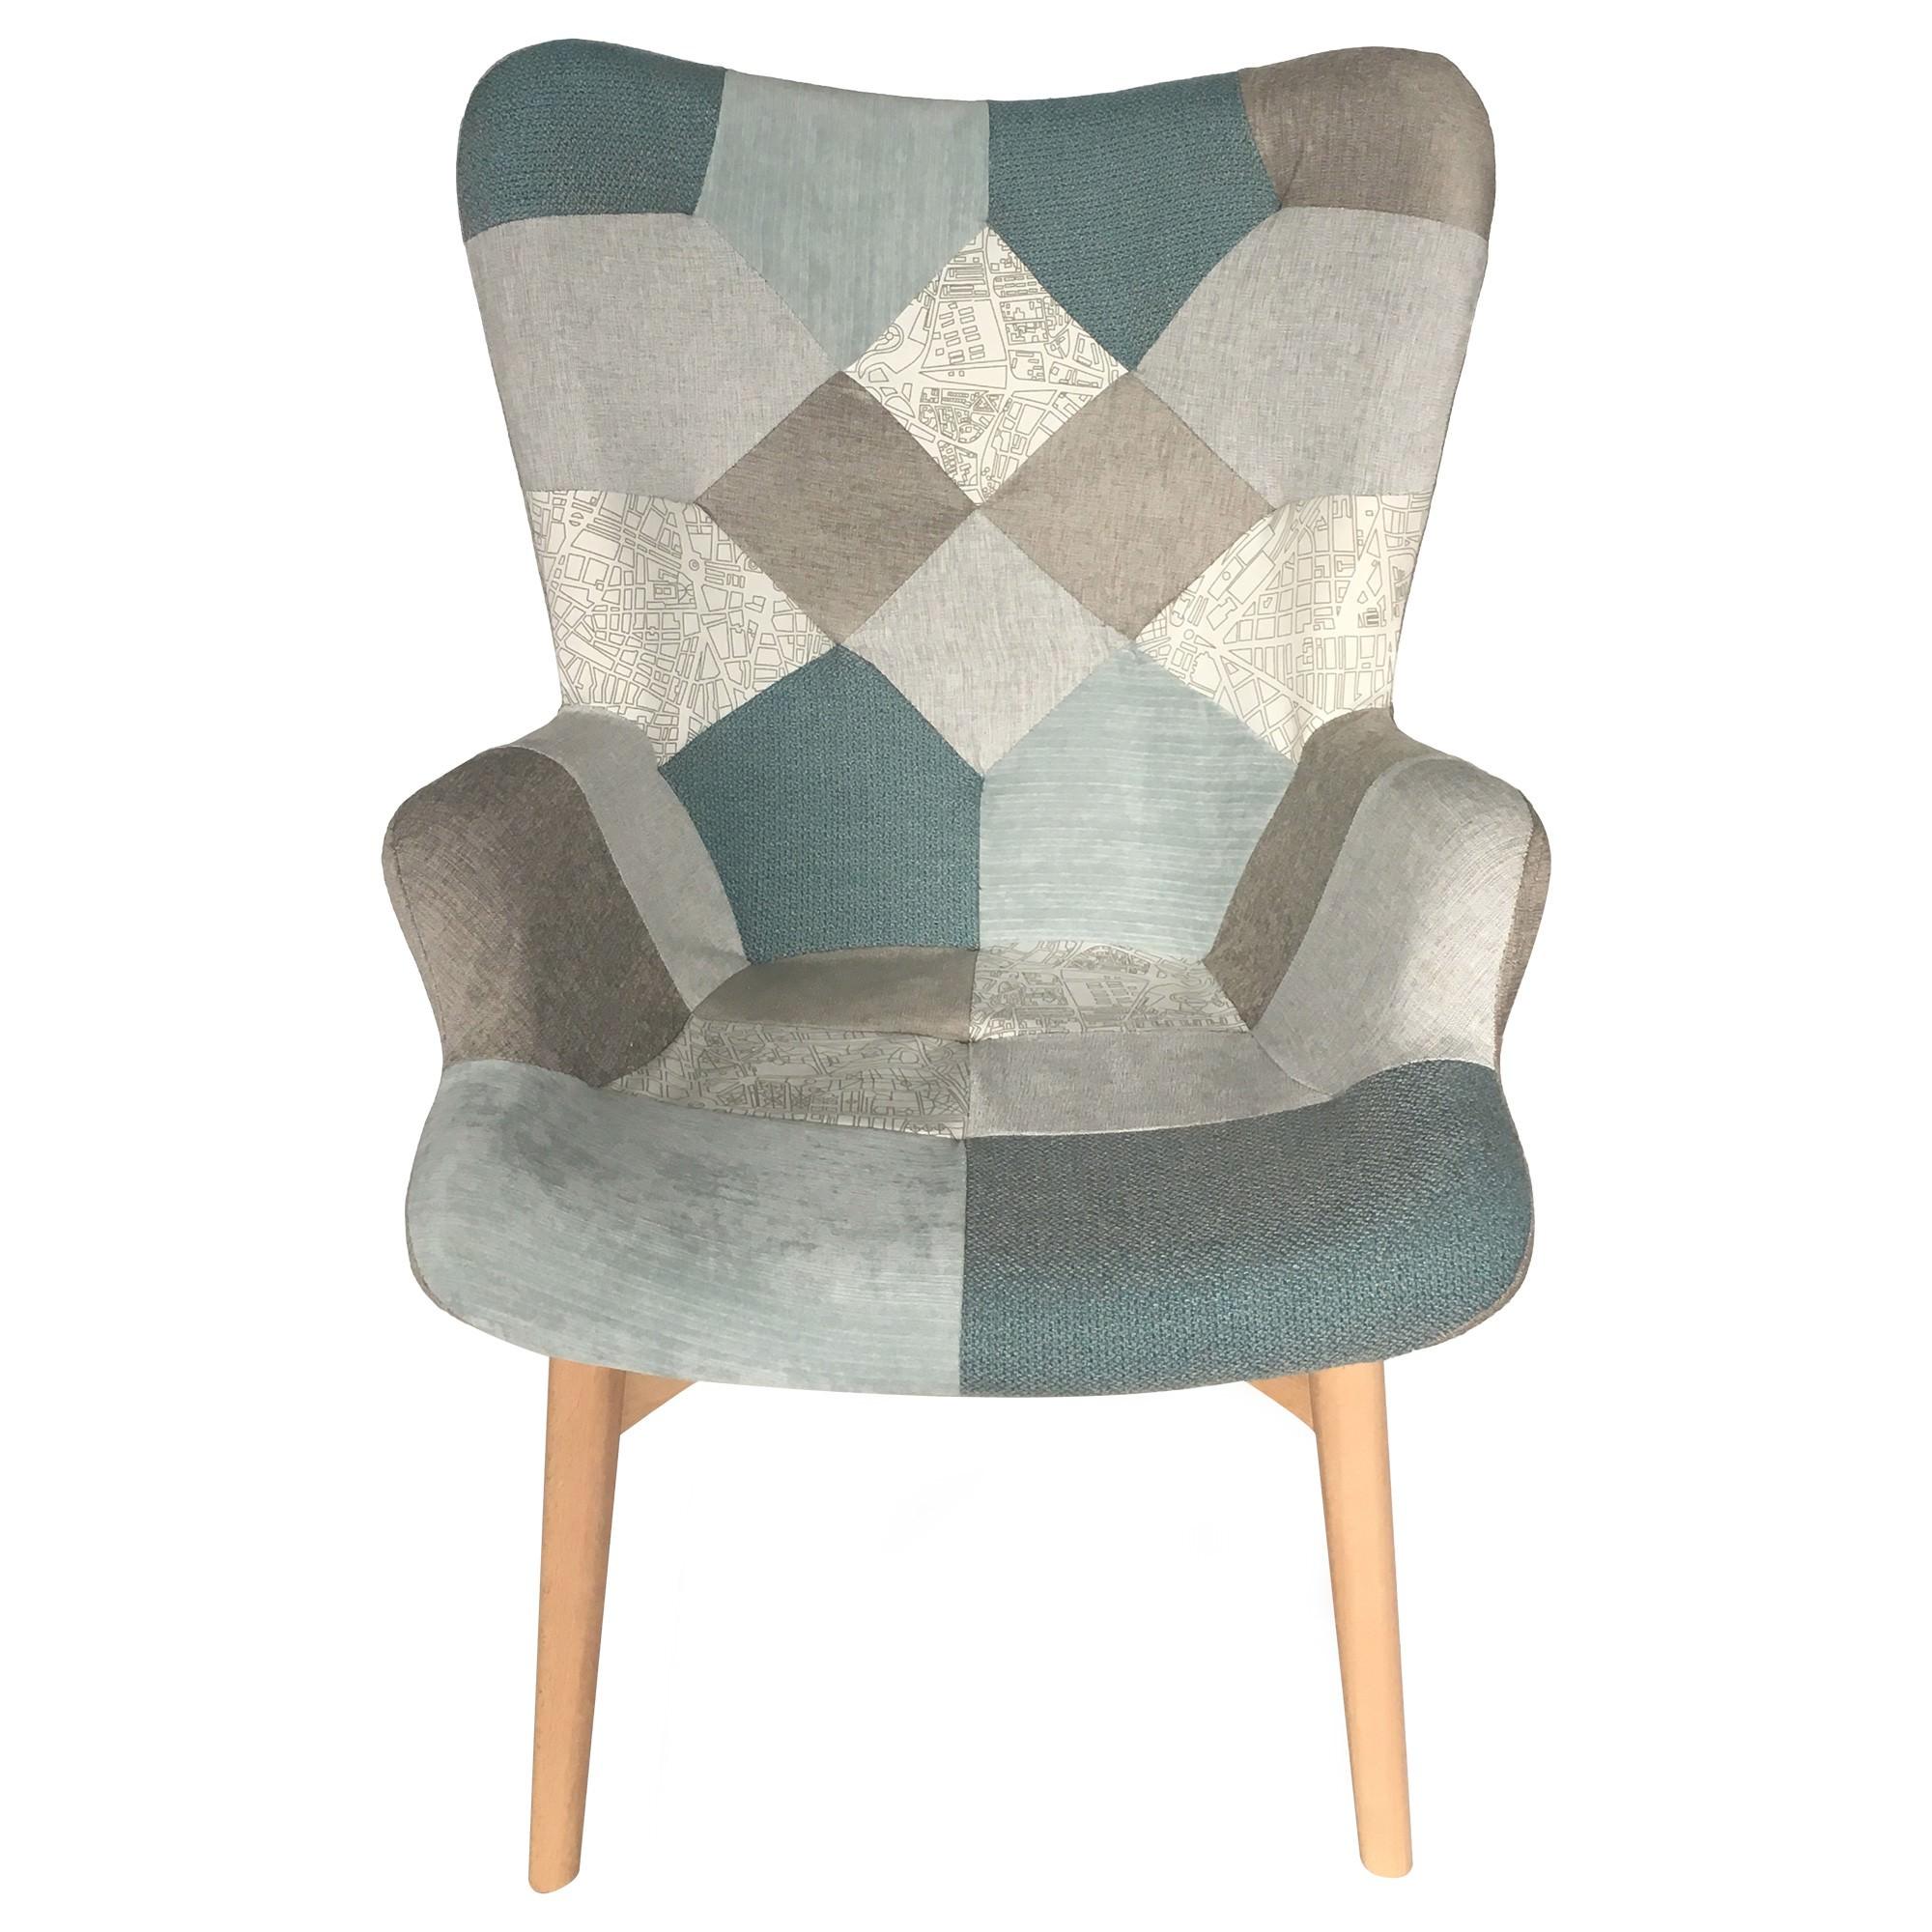 Dalbert Patchwork Fabric Armchair, Teal / Grey